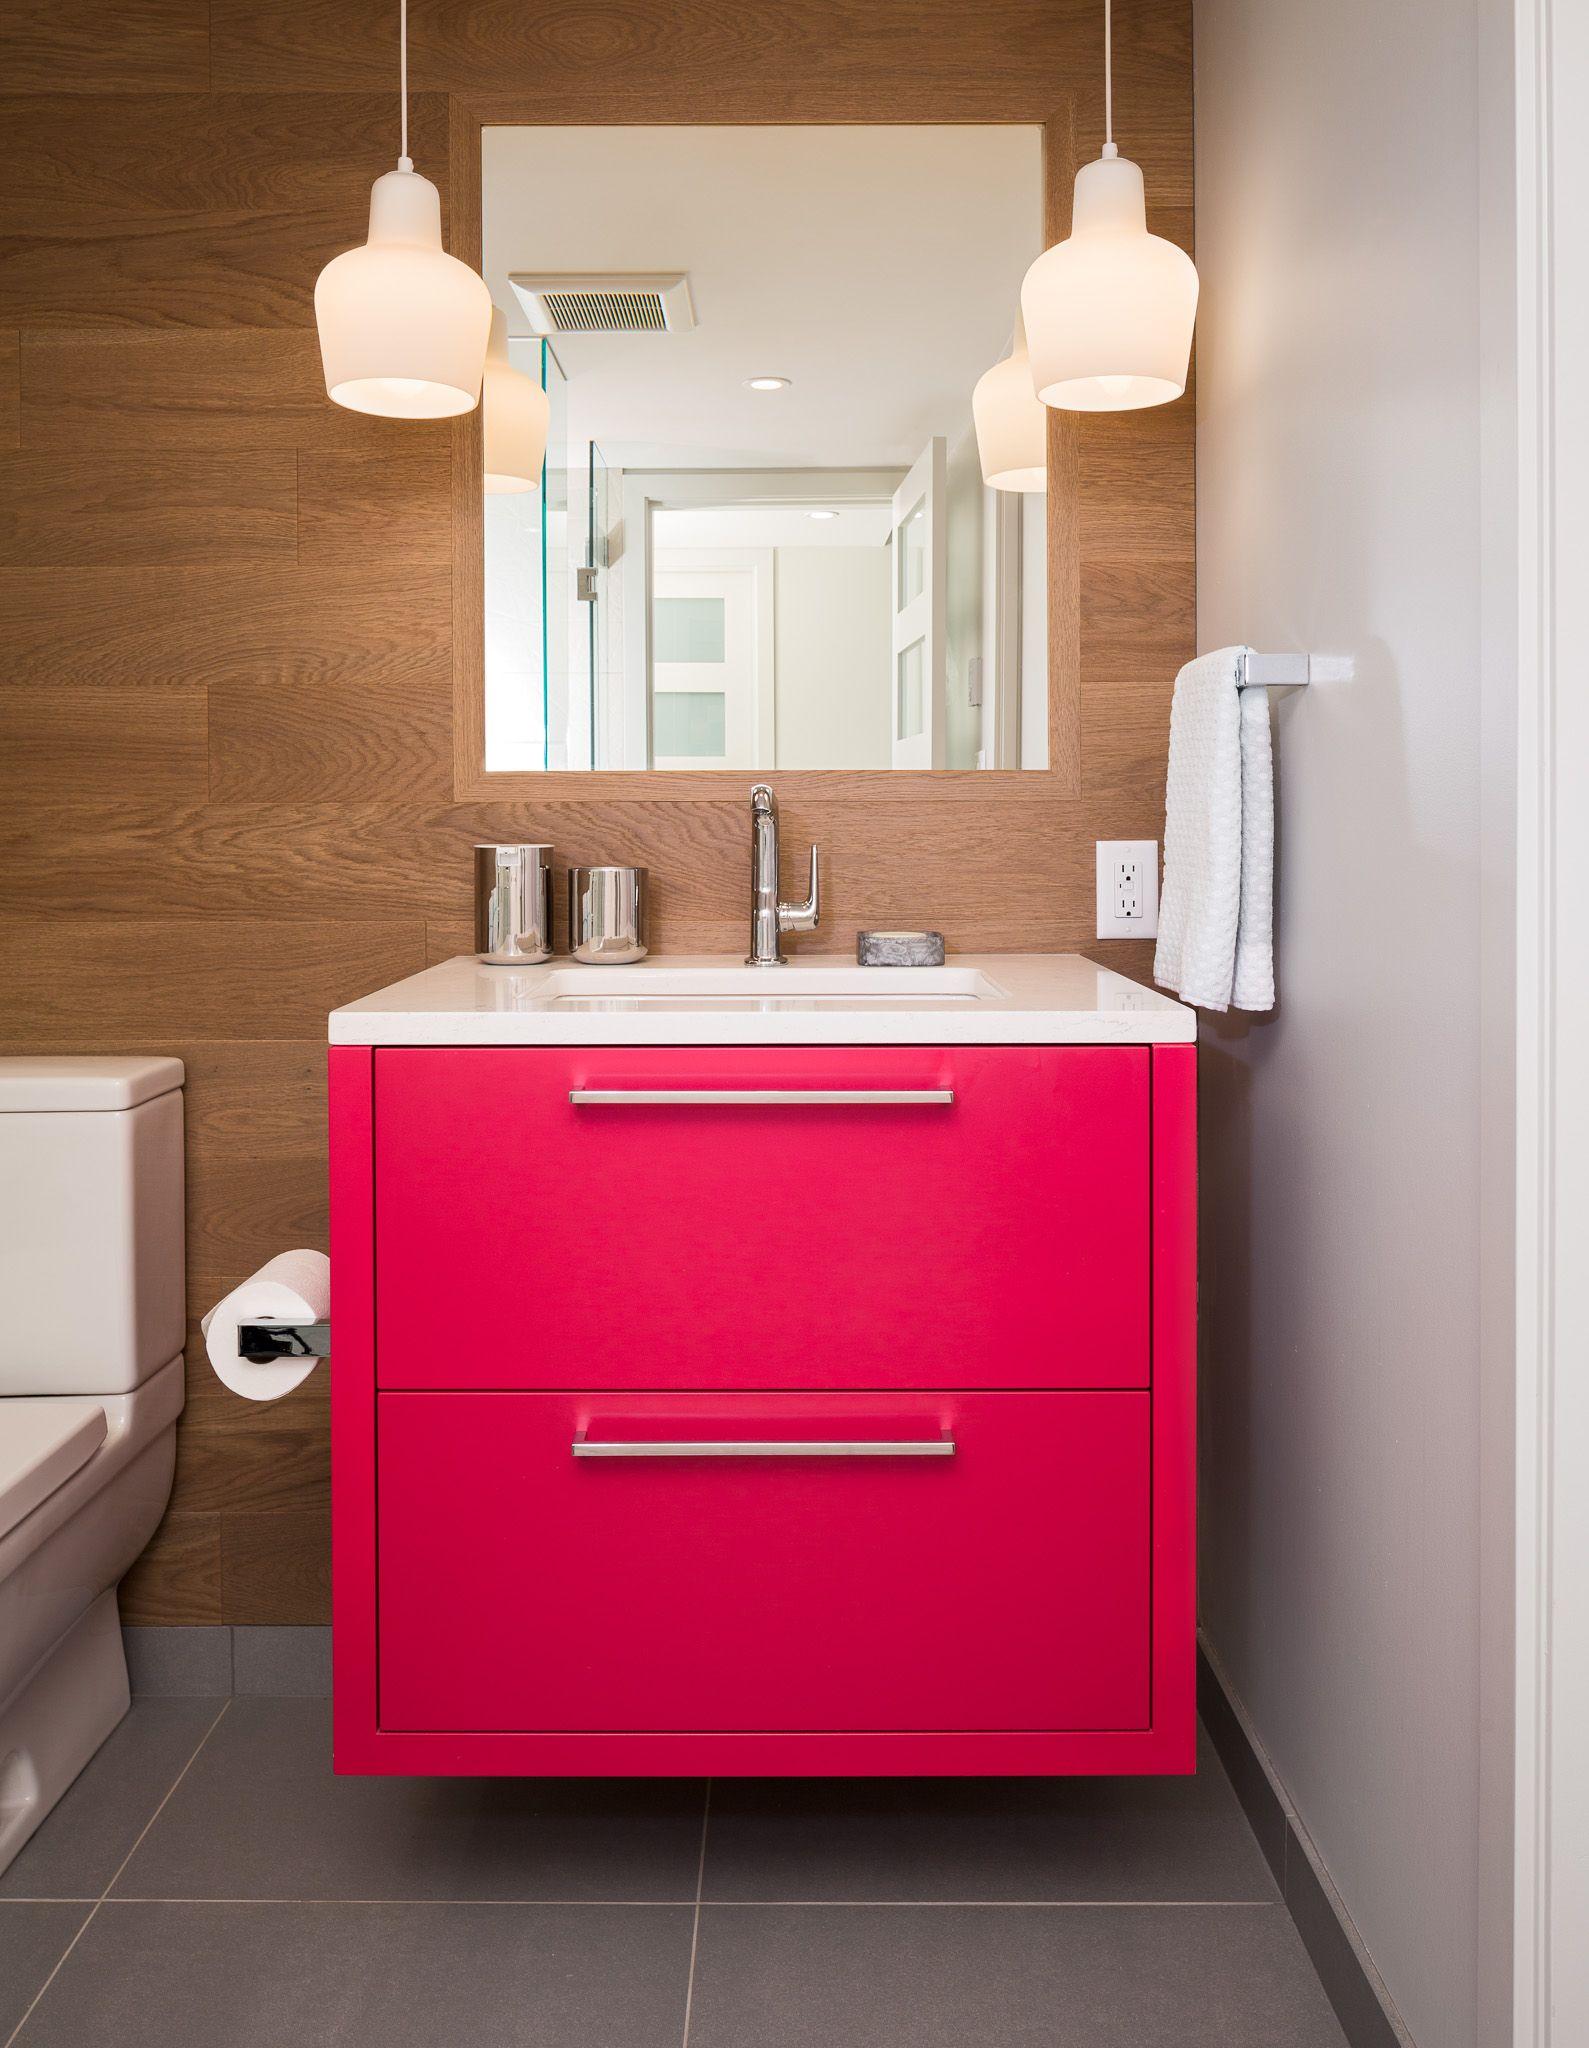 Salle De Bain Petite Fille ~ bathroom colourful custom vanity alvar aalto a440 pendants wood